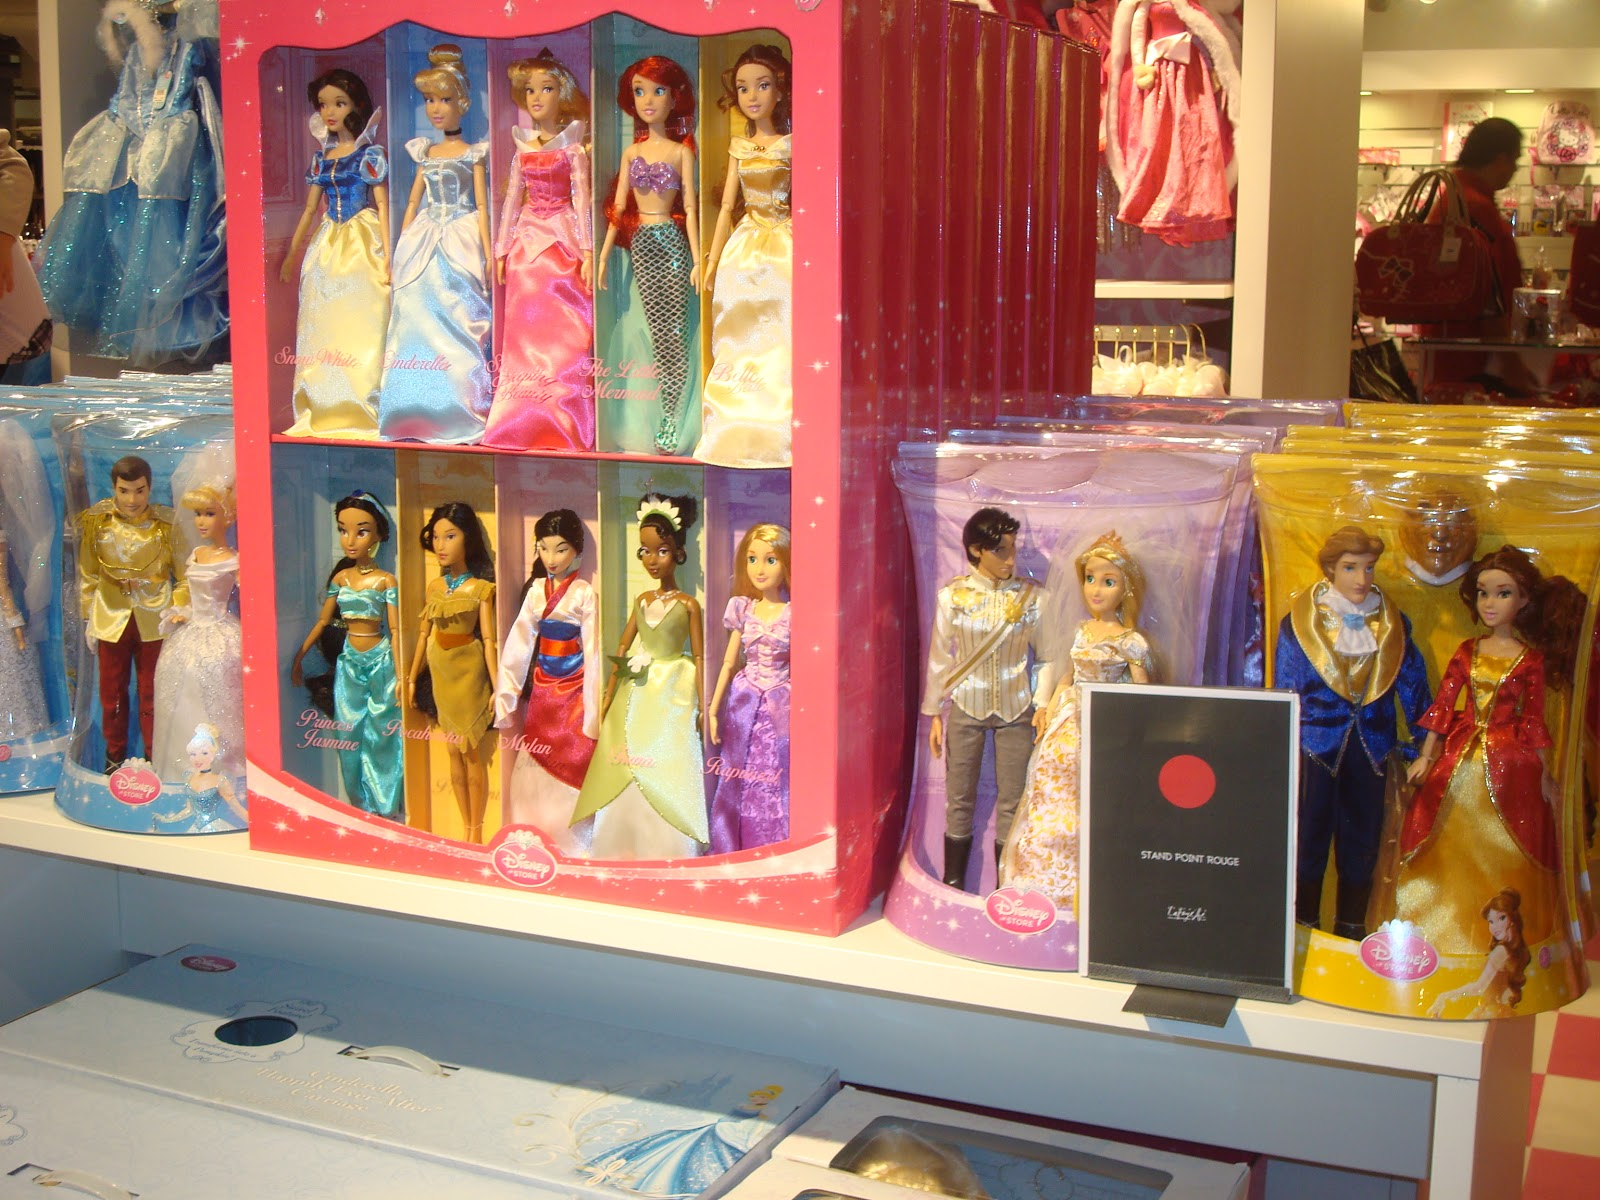 mini princesses disney cendrillon de mattel. Black Bedroom Furniture Sets. Home Design Ideas